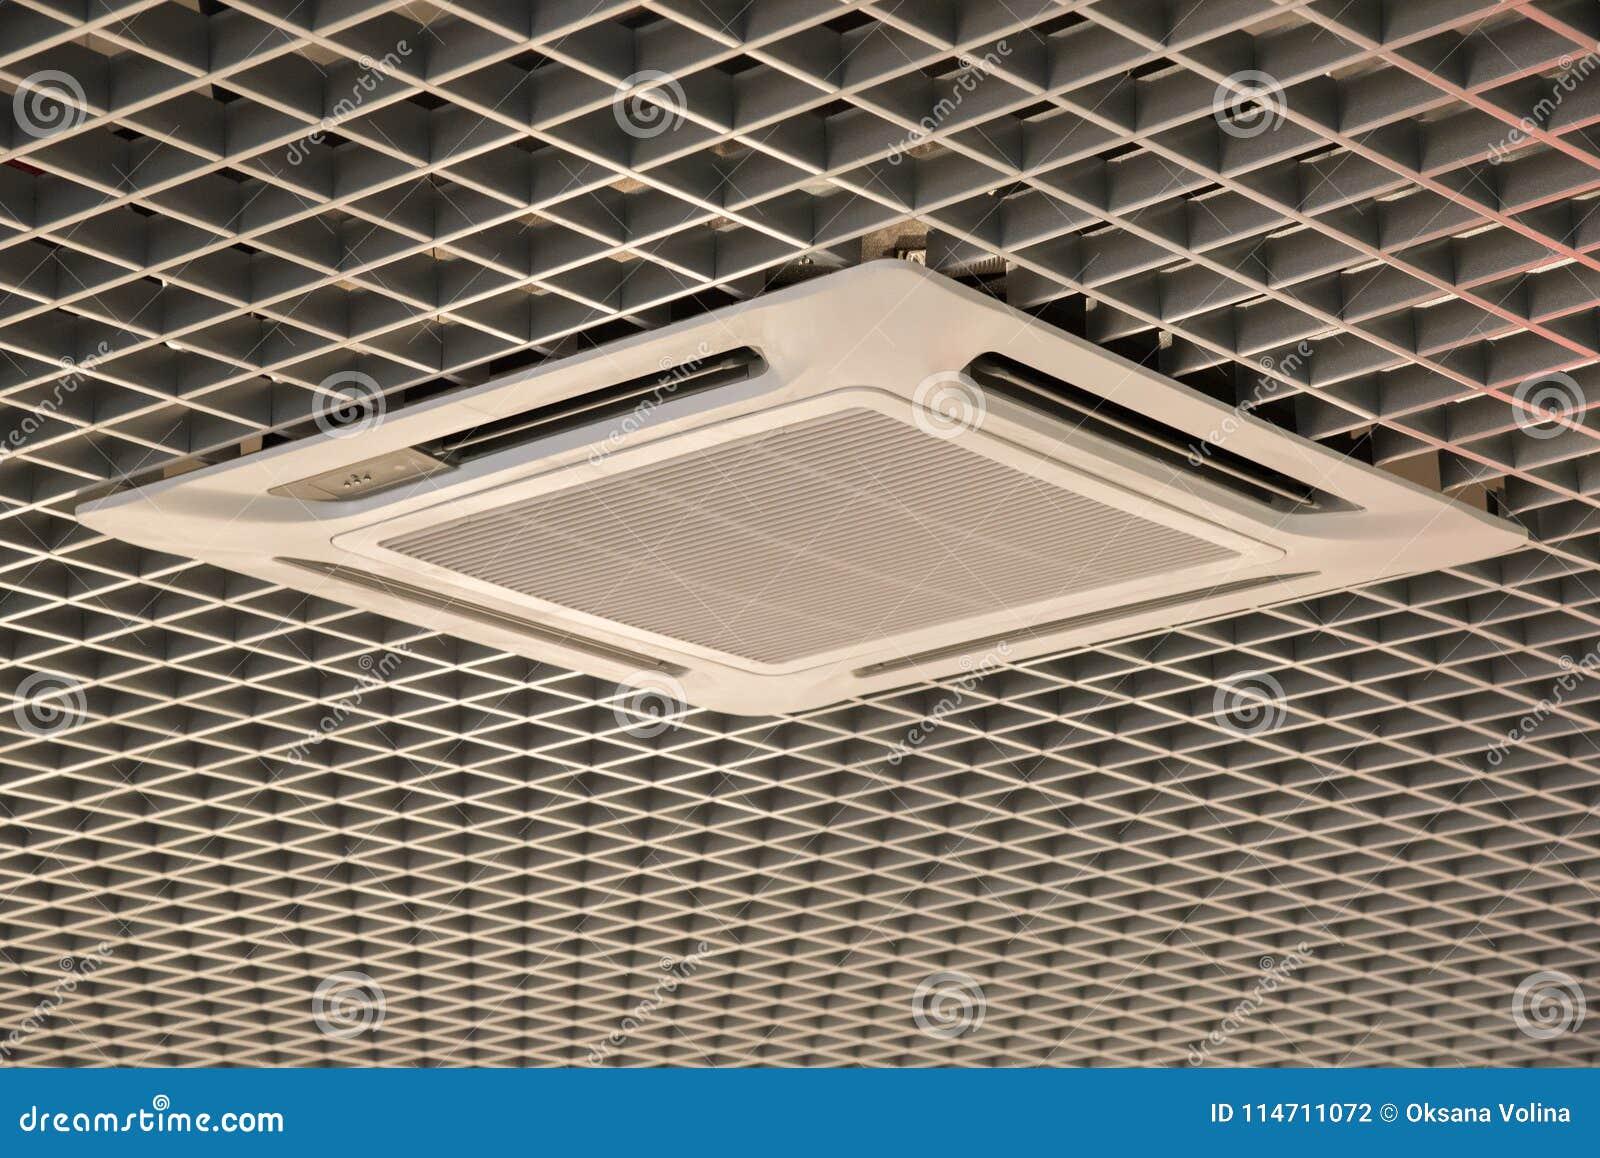 Vlotte mooi trellised plafond binnen met airconditioning